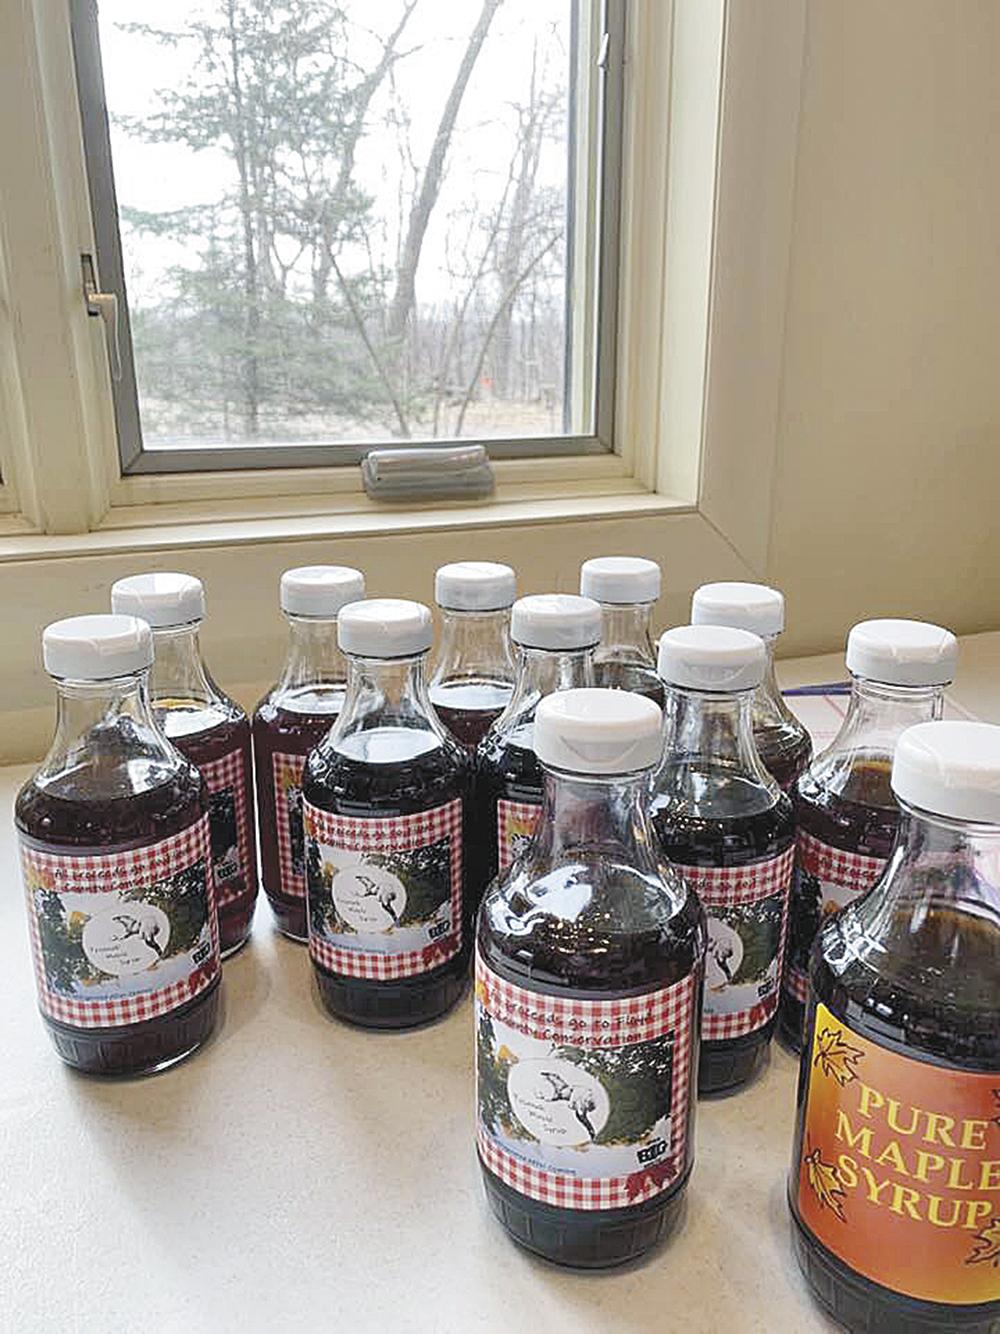 Tosanak maple syrup ready to enjoy